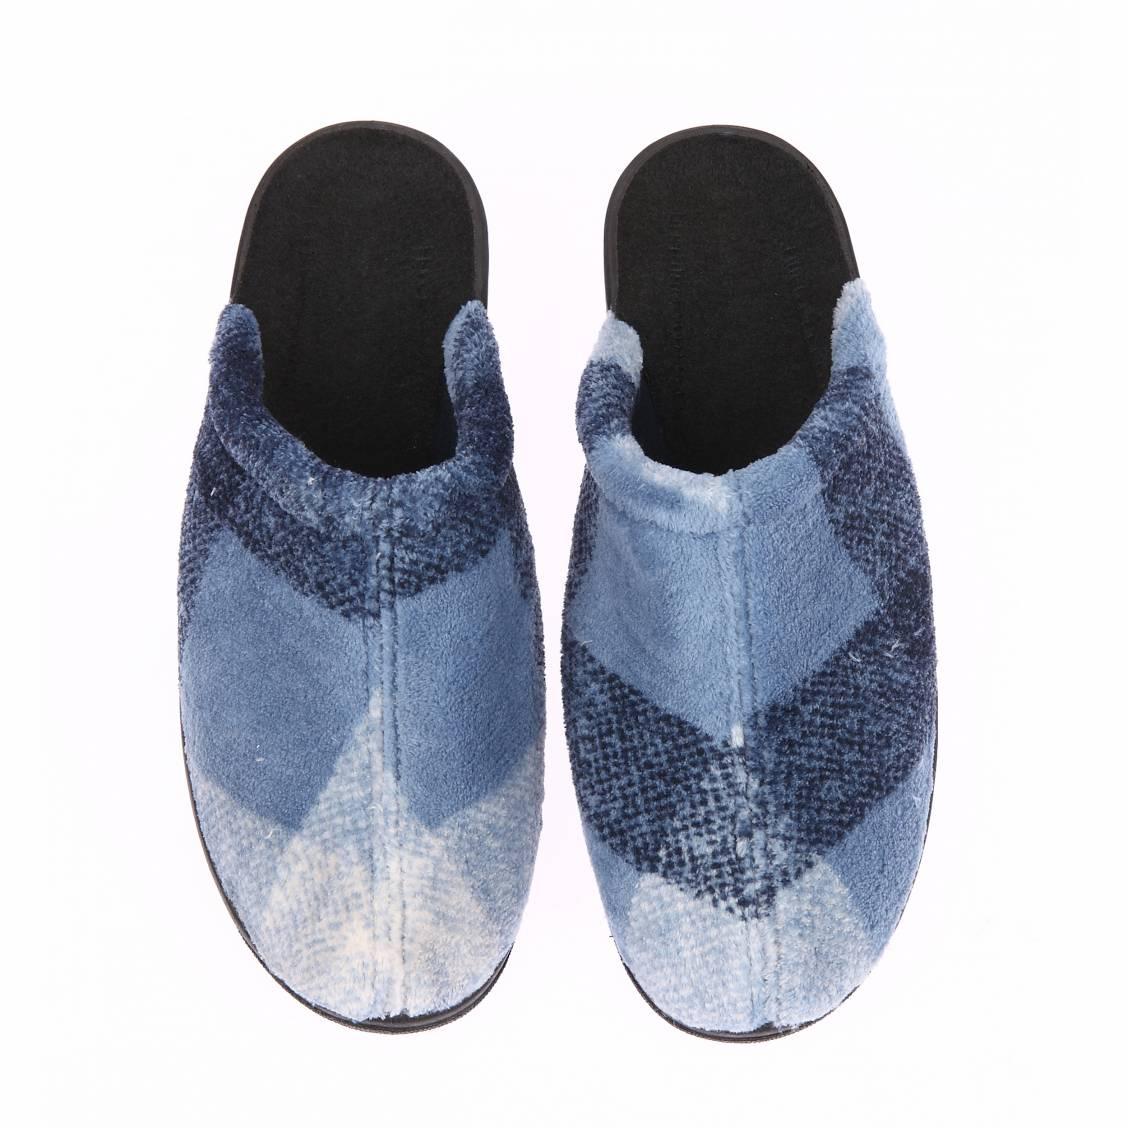 chaussons chaud givry christian cane bleus rue des hommes. Black Bedroom Furniture Sets. Home Design Ideas